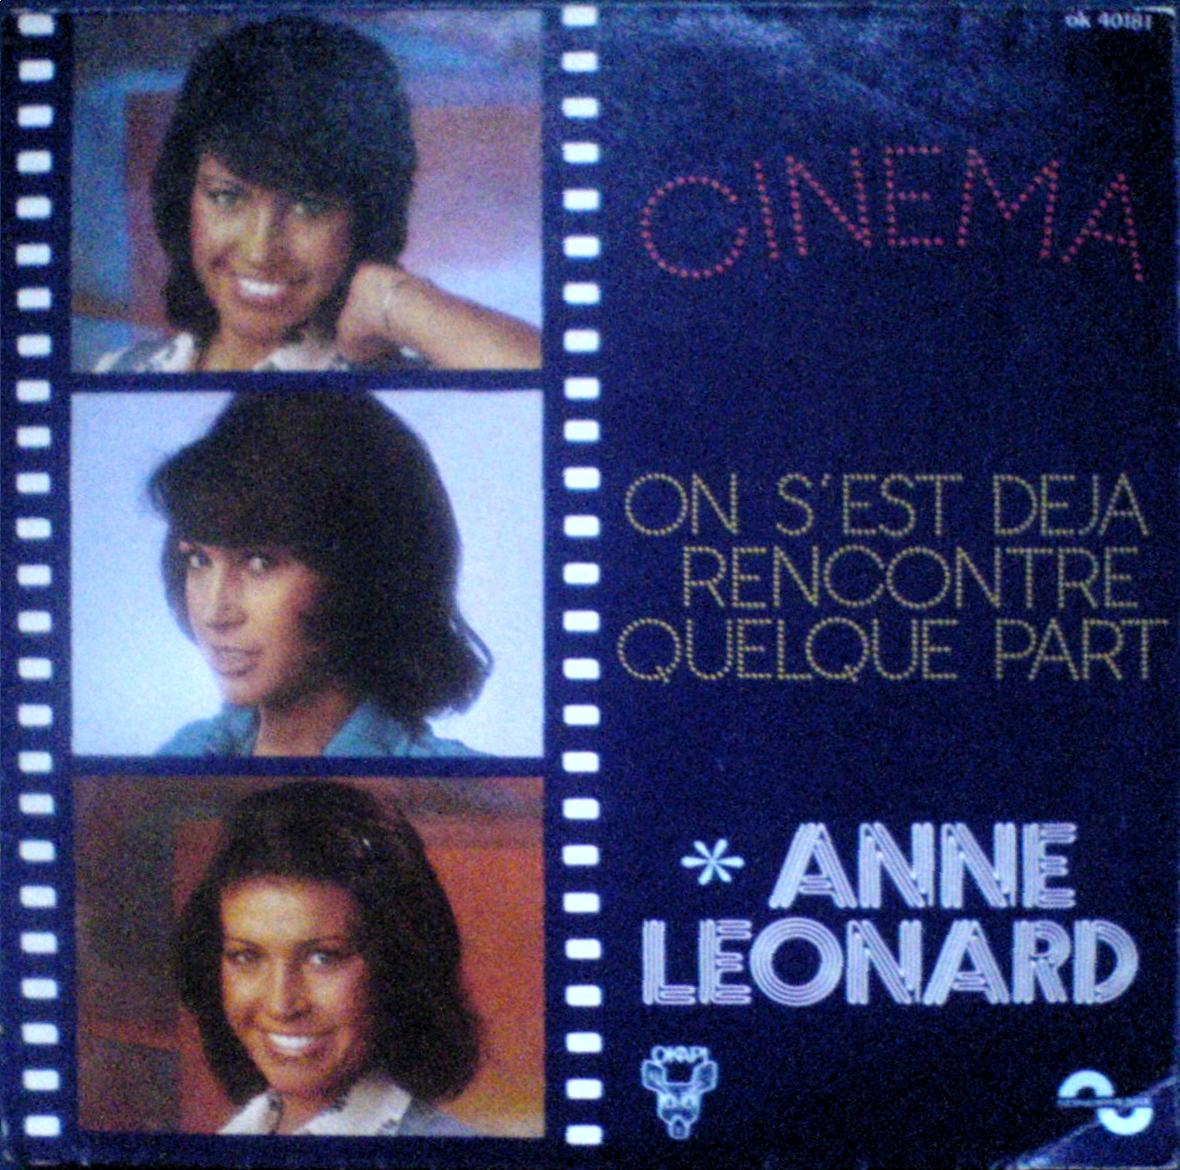 Anne Leonard cinema 1974